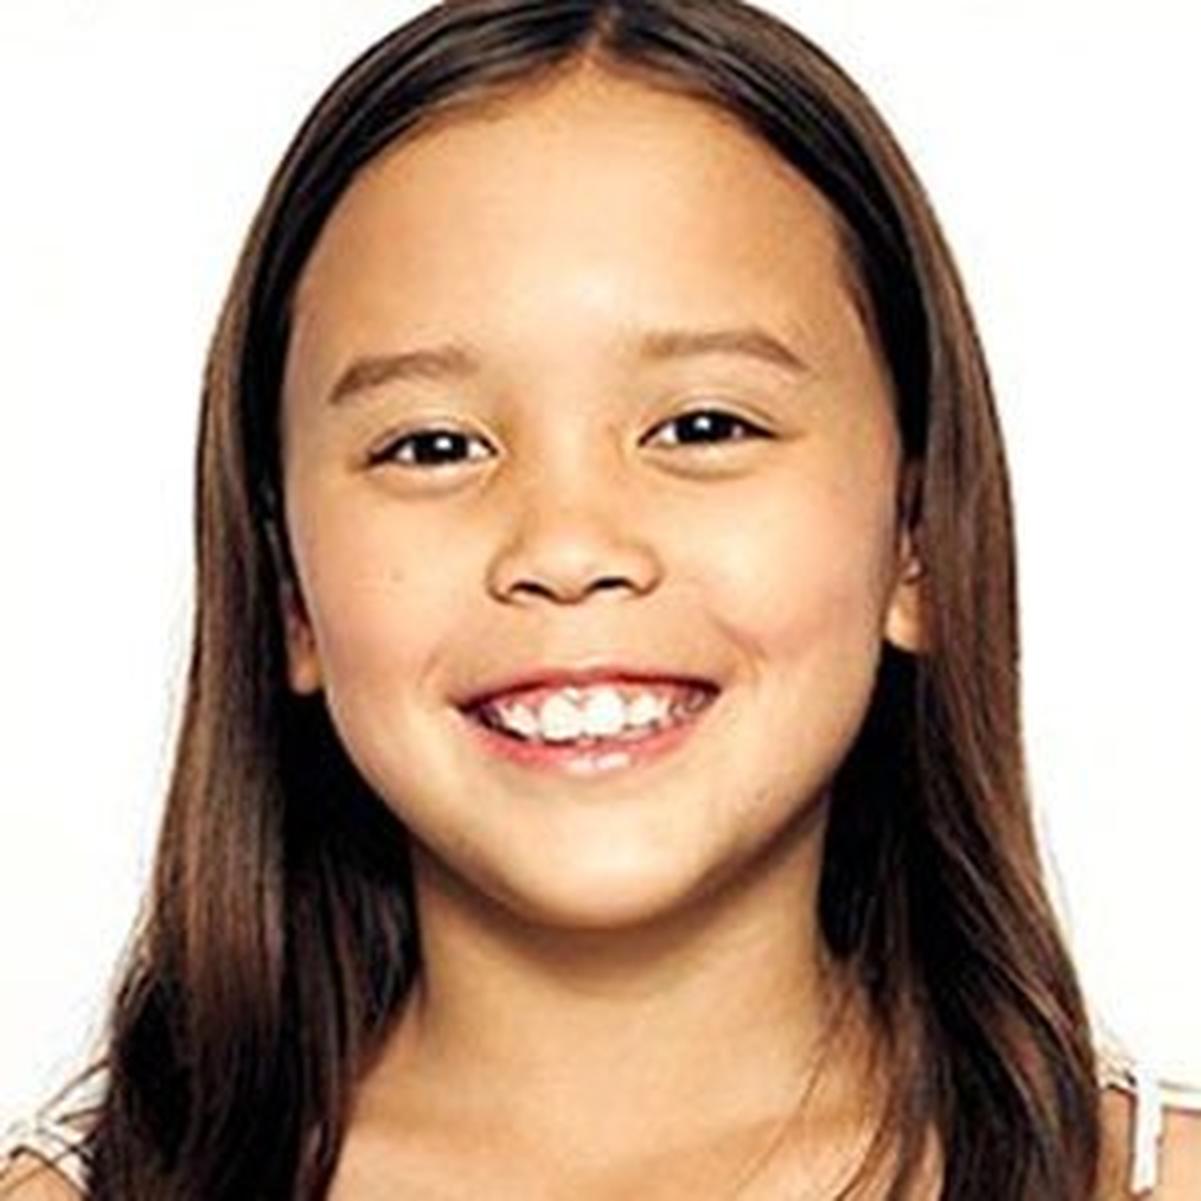 Leah Gosselin wiki, Leah Gosselin bio, Leah Gosselin news